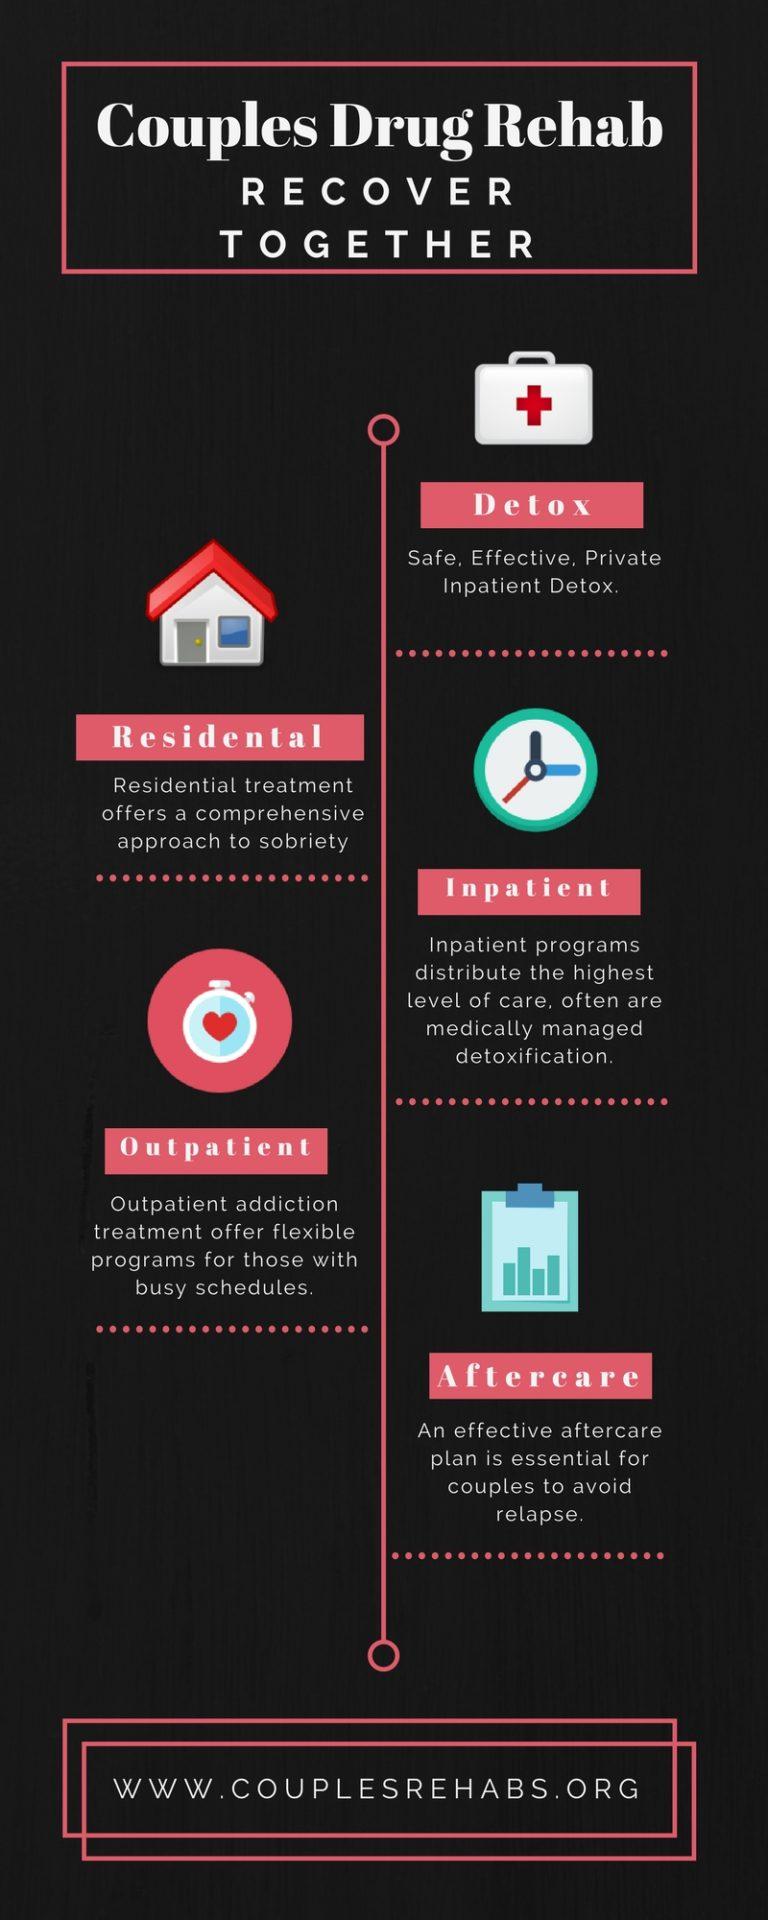 Couples-Drug-Rehab-infographic.jpg